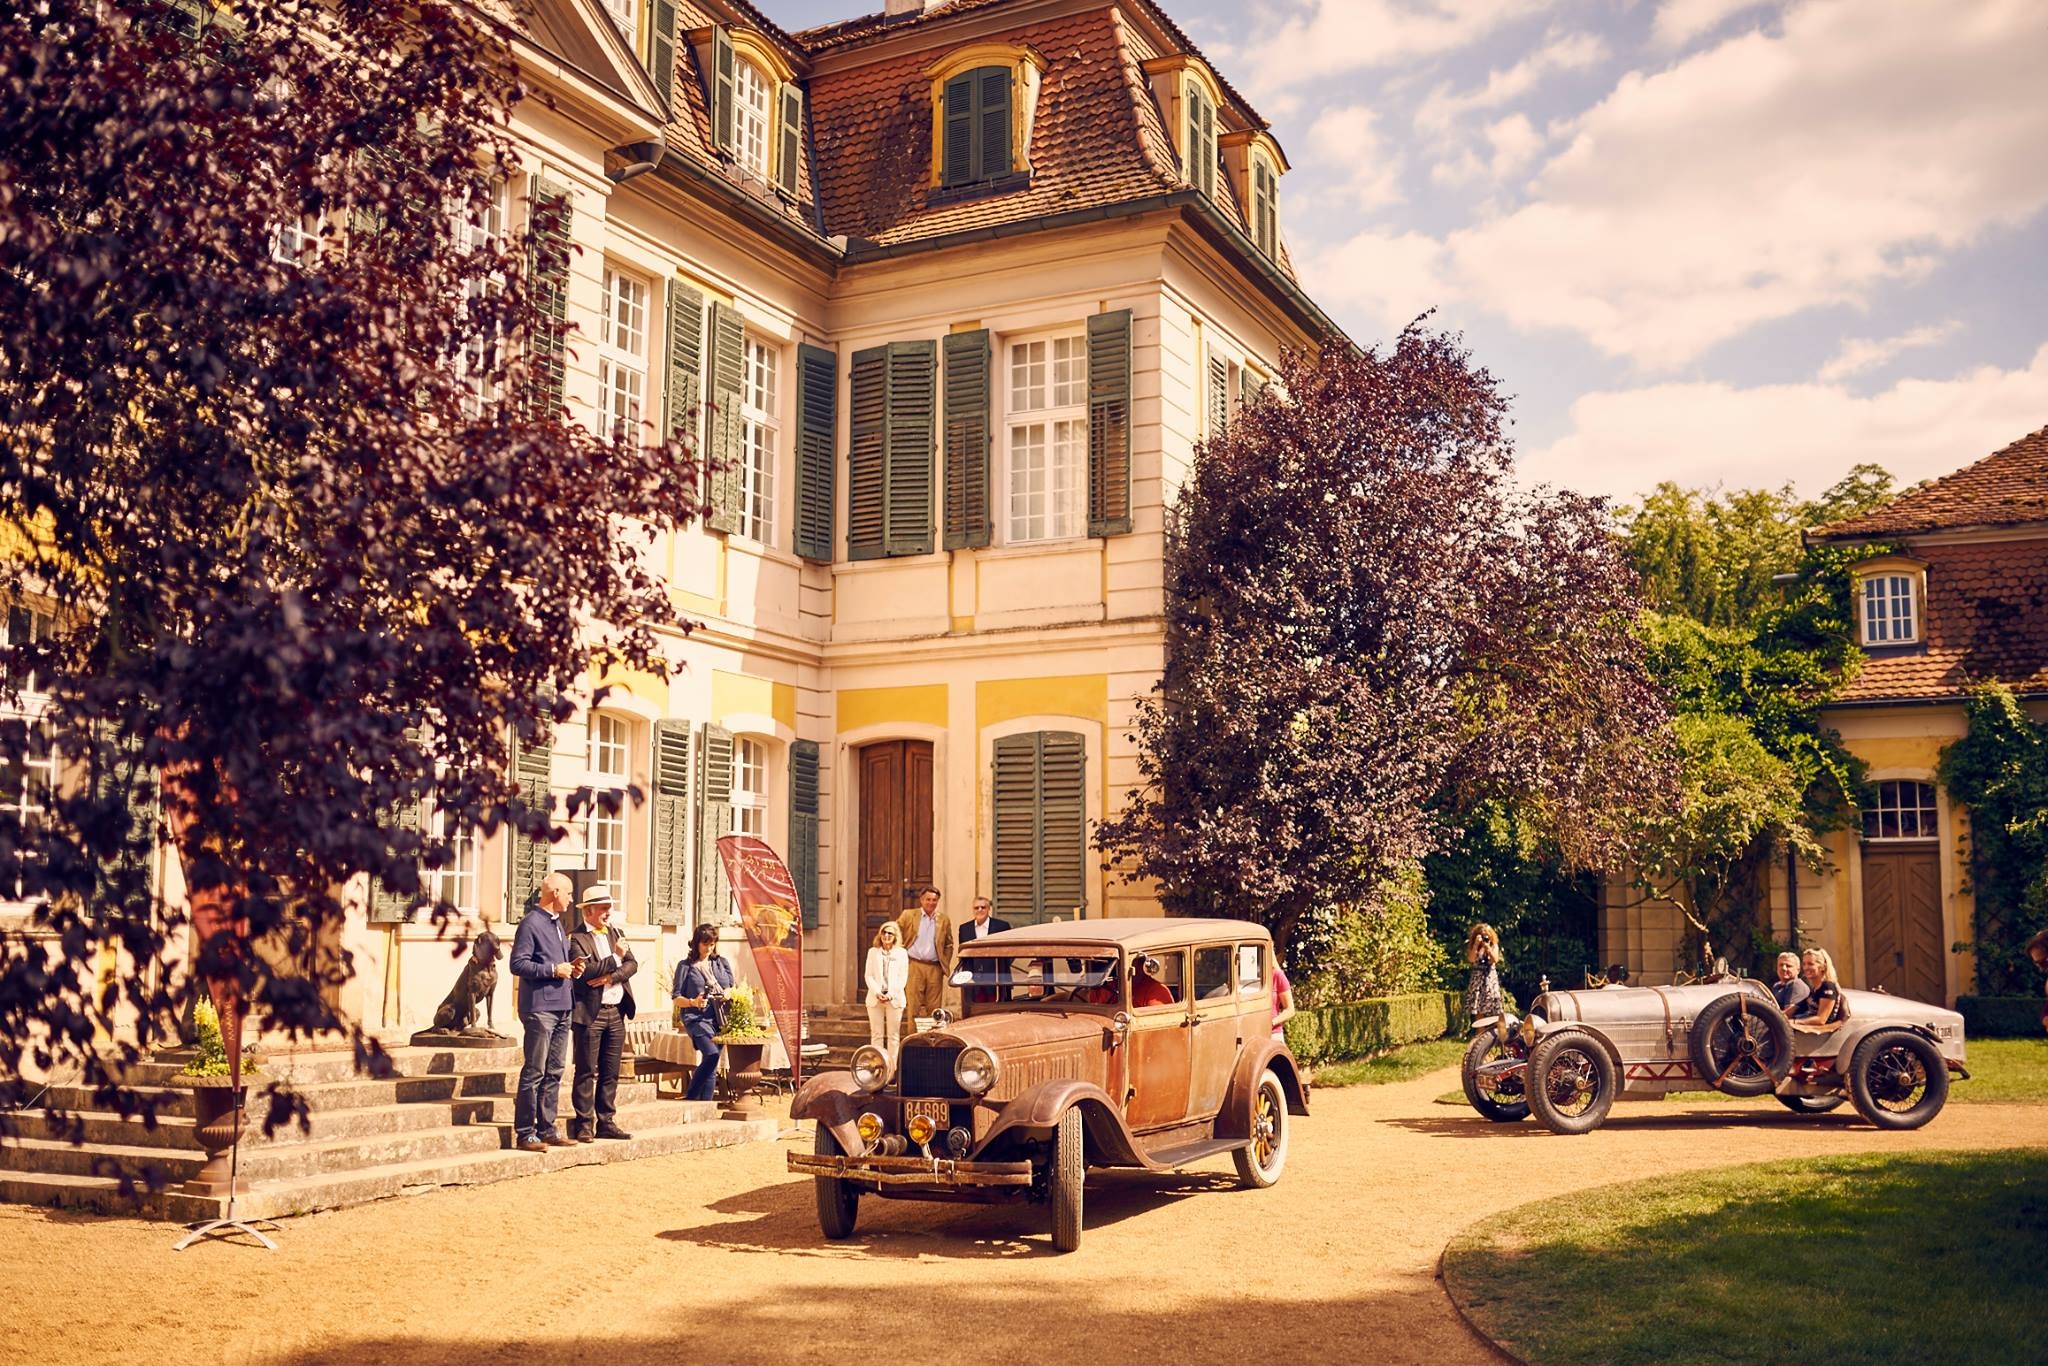 3. Festival of Classic Cars @ Schlosspark